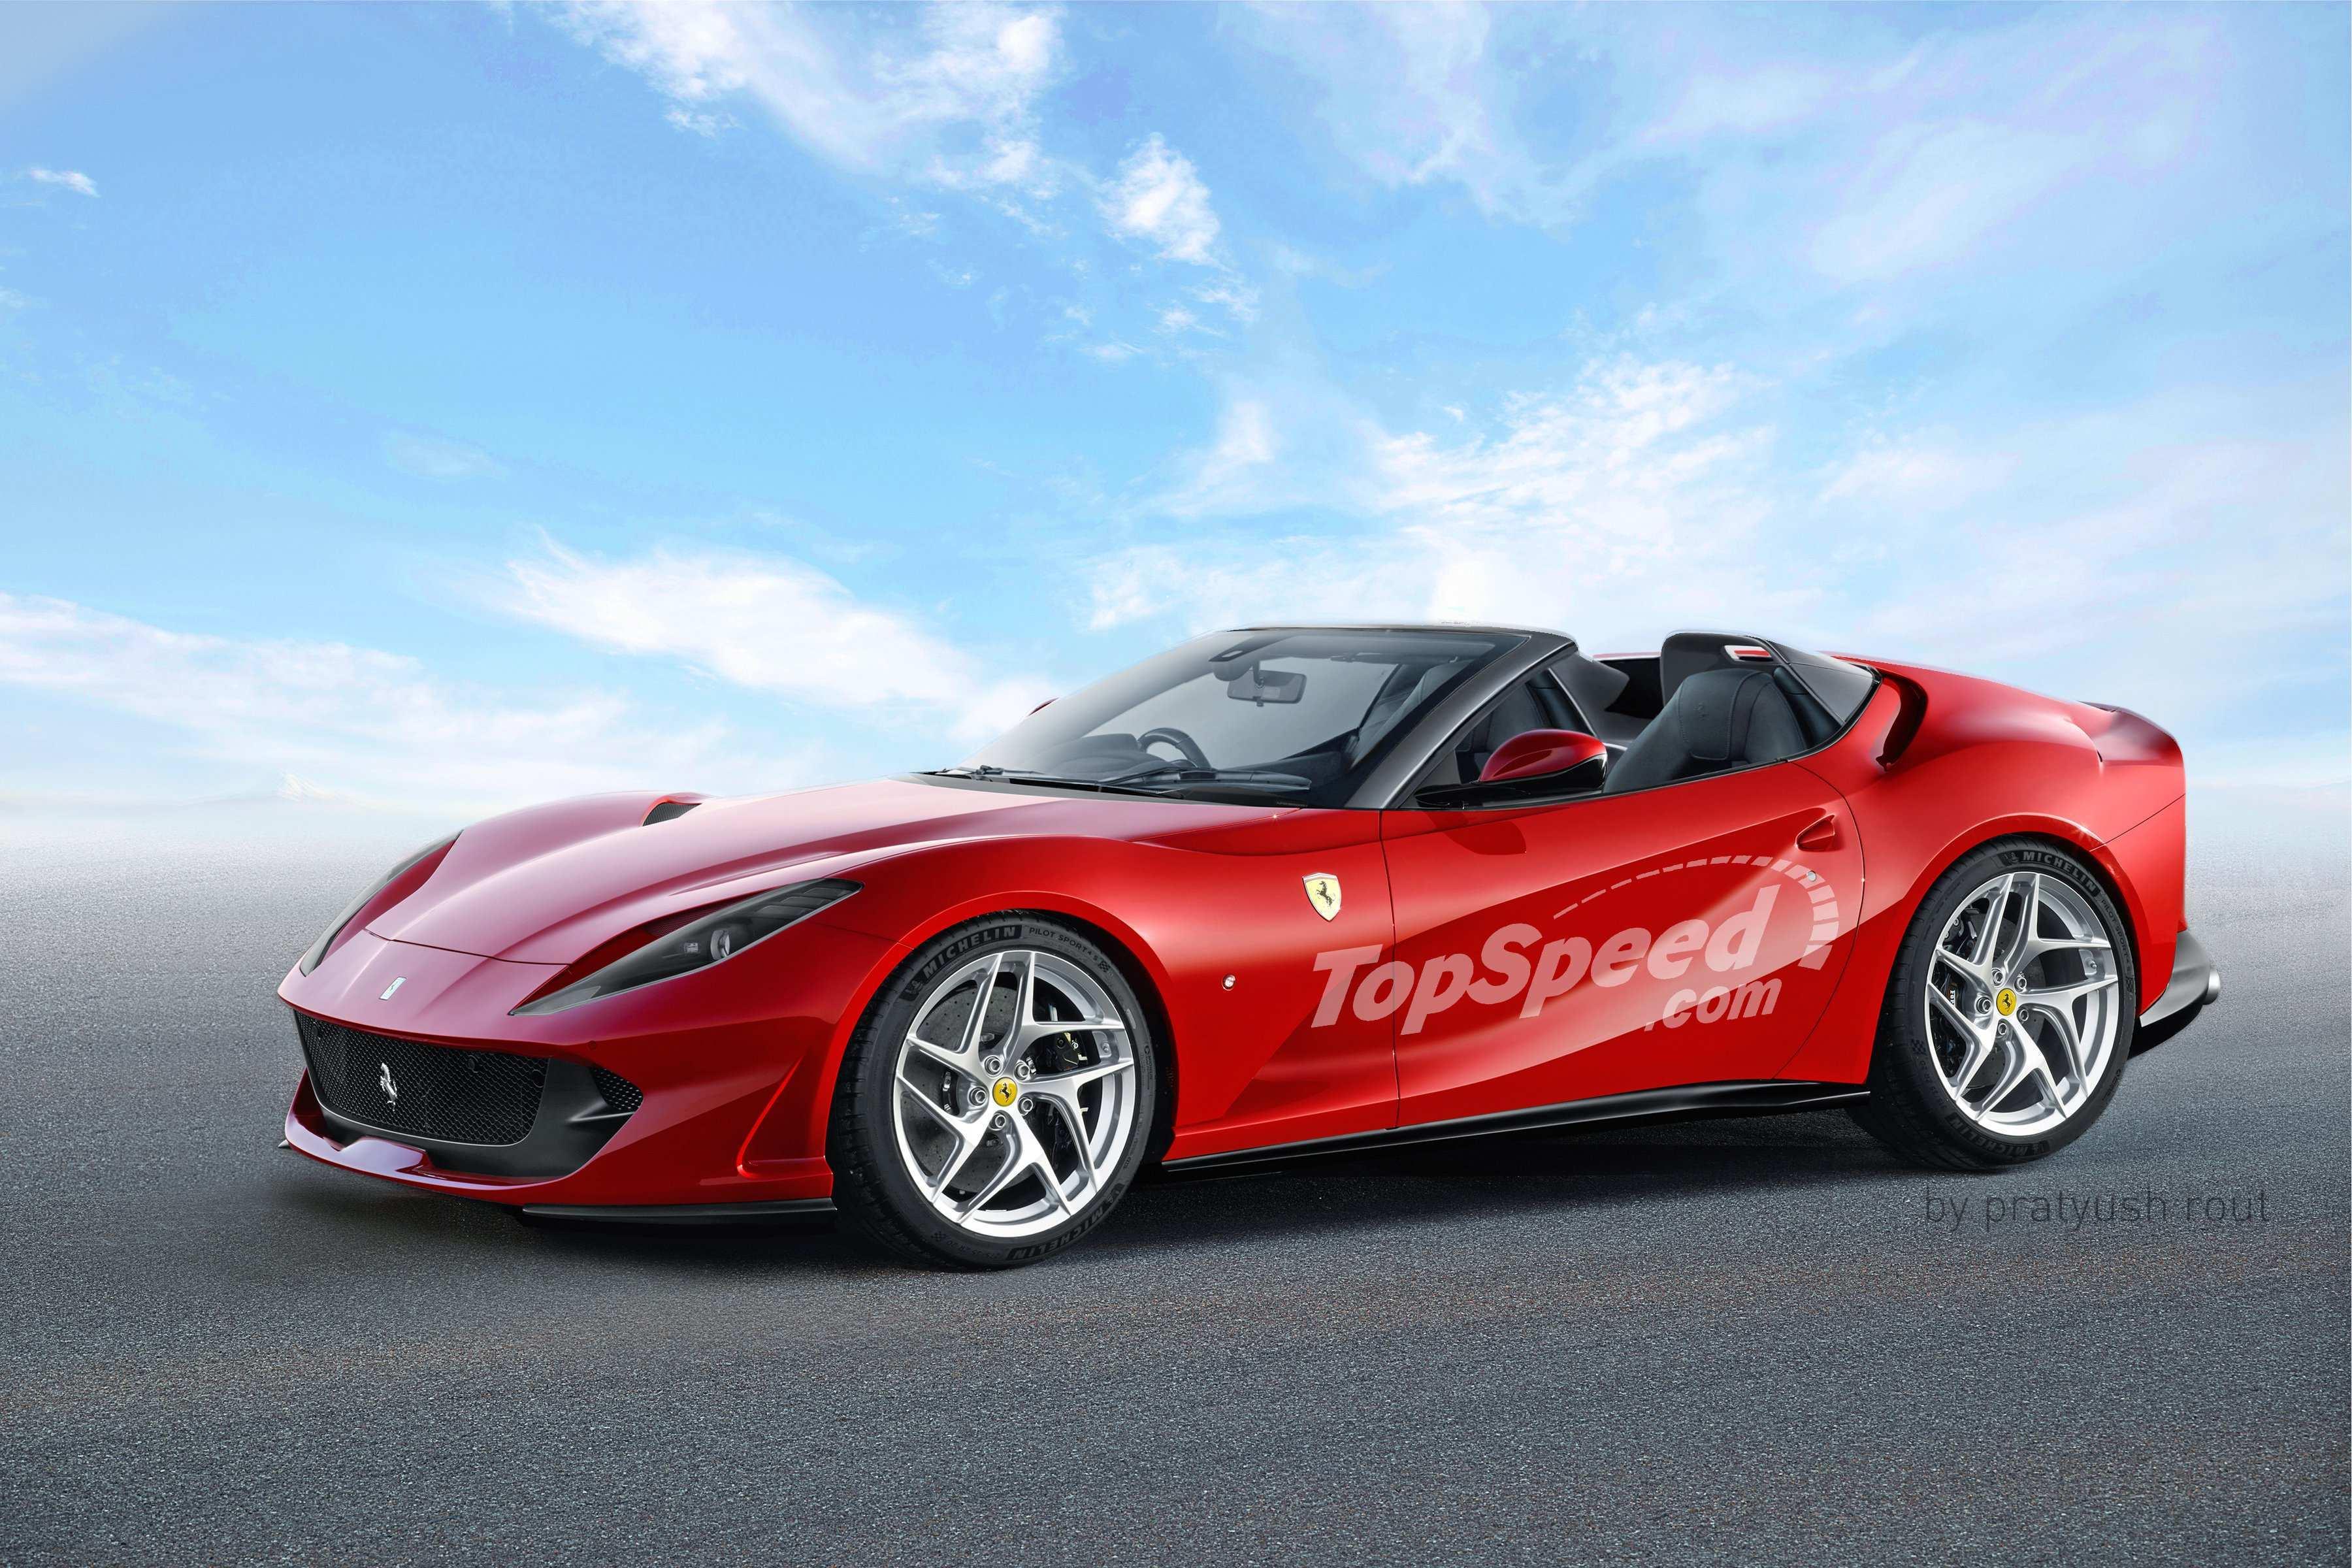 25 All New 2019 Ferrari Convertible First Drive with 2019 Ferrari Convertible